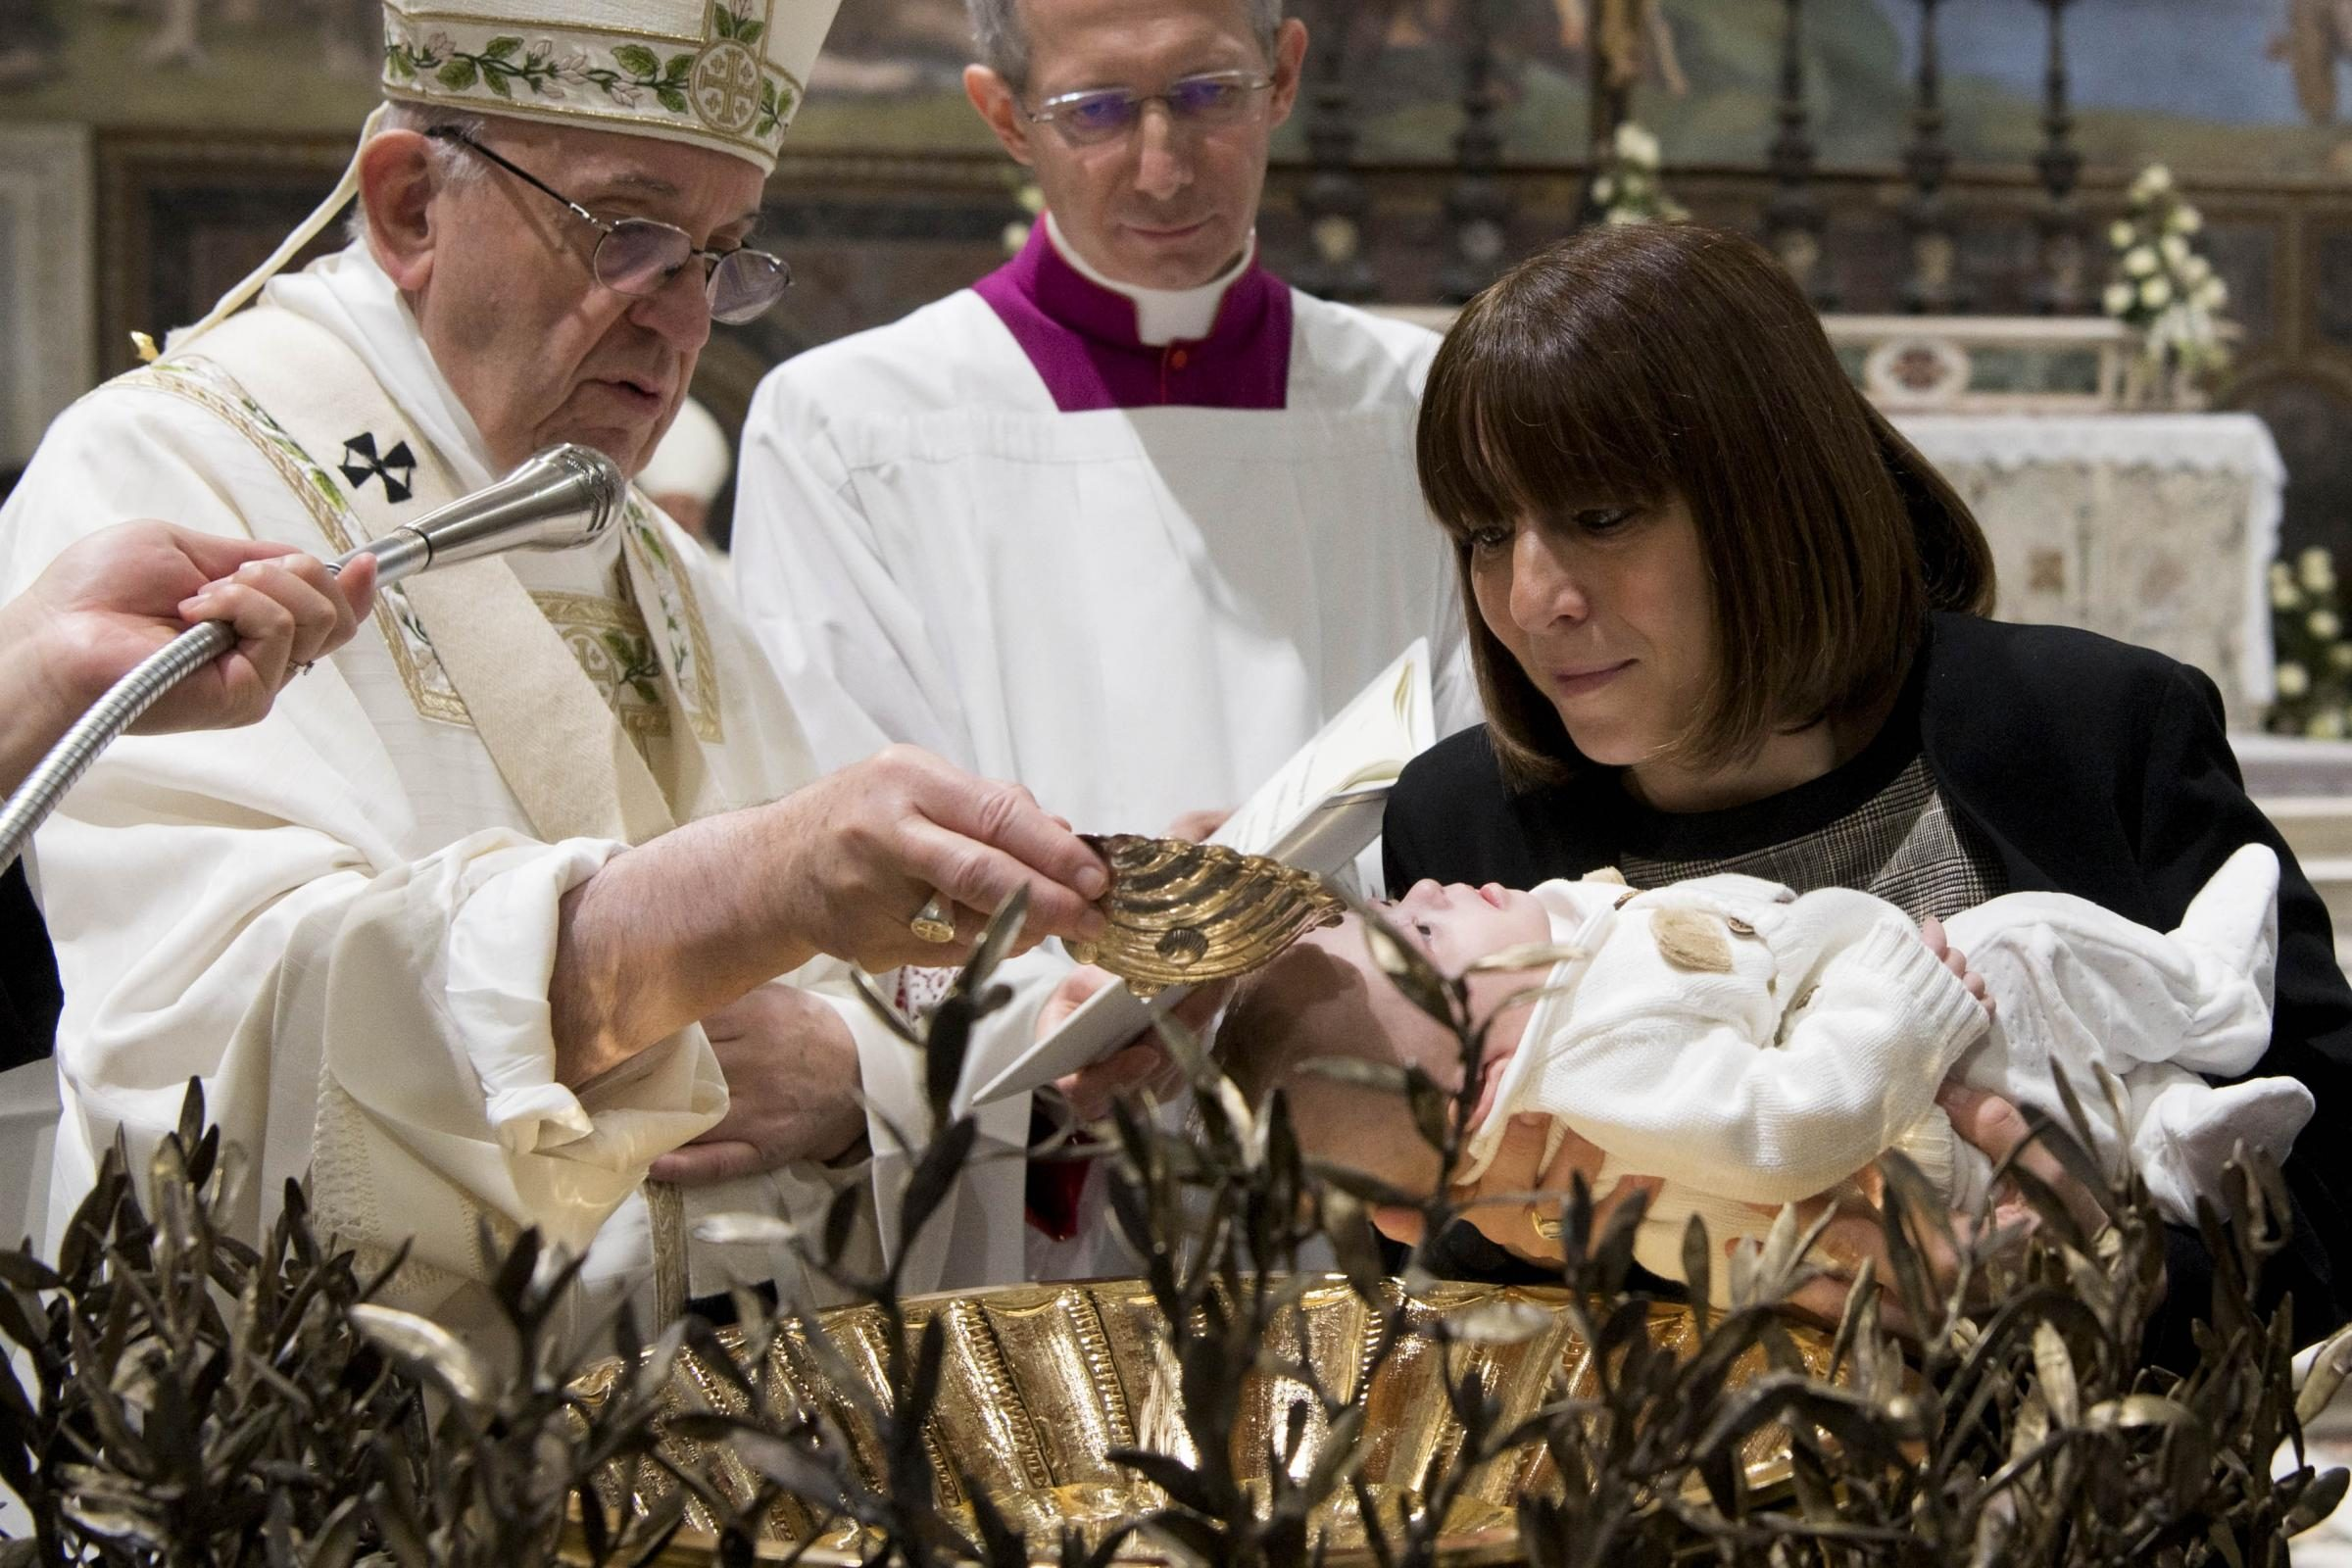 cattolico dating donna divorziata